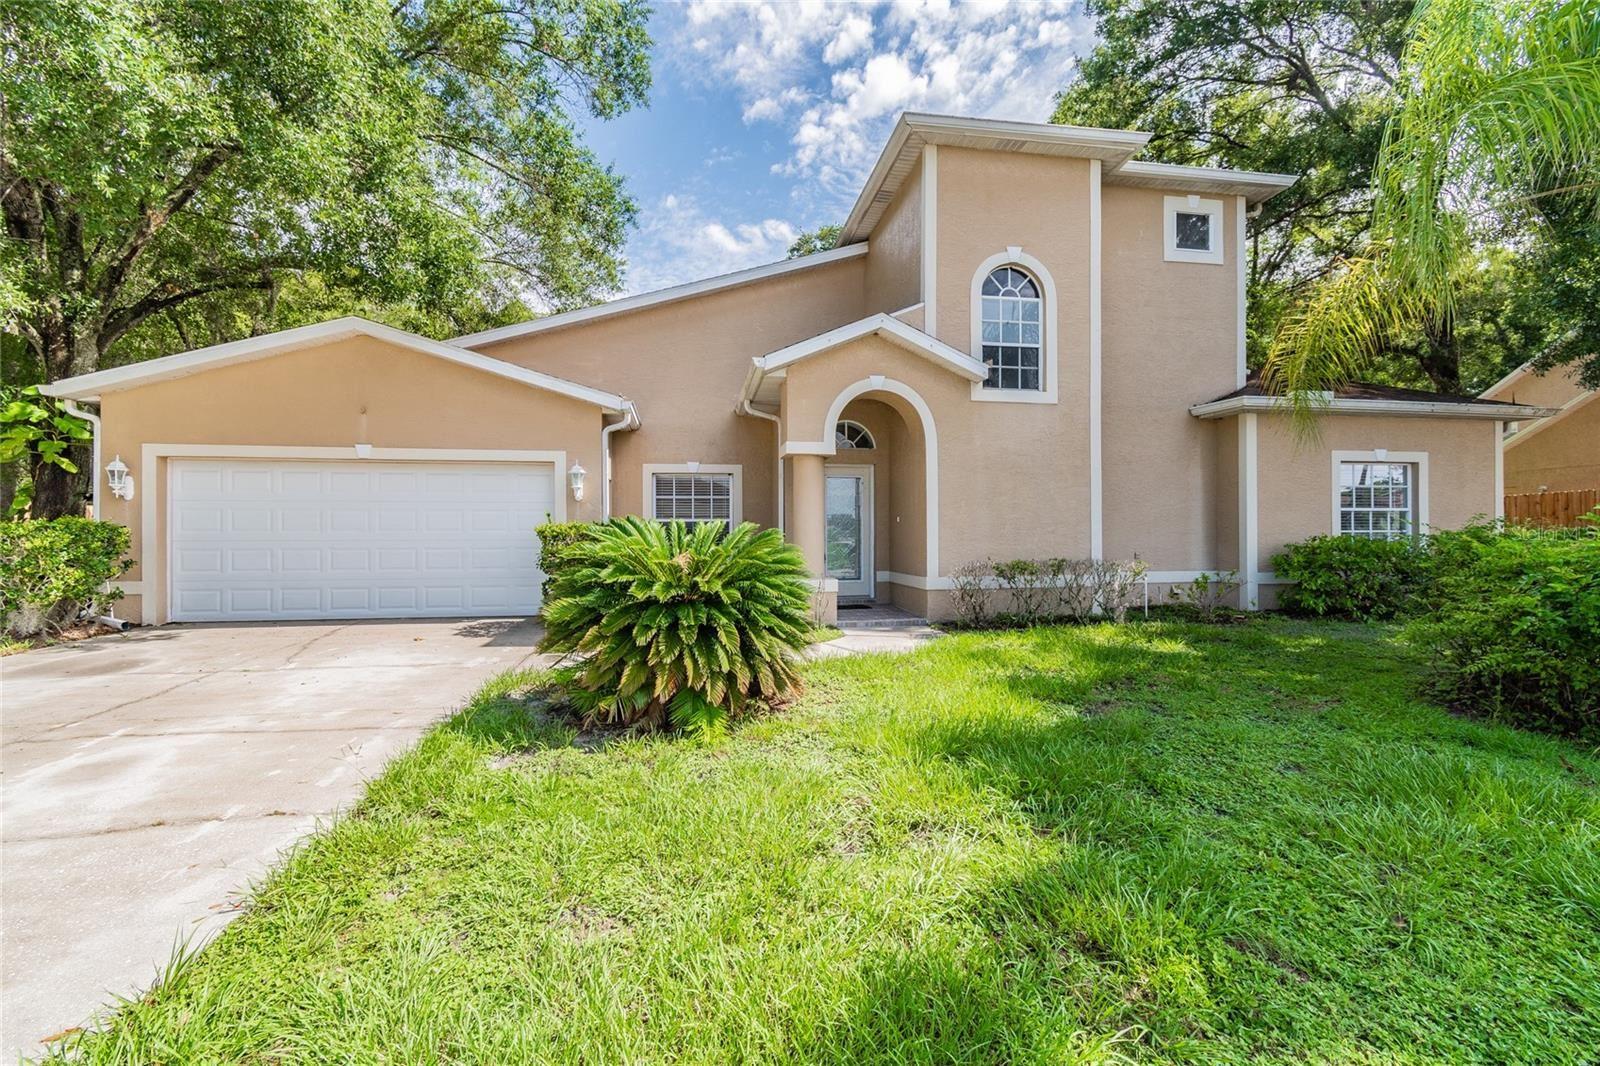 11017 LYNN LAKE CIRCLE, Tampa, FL 33625 - #: T3314069